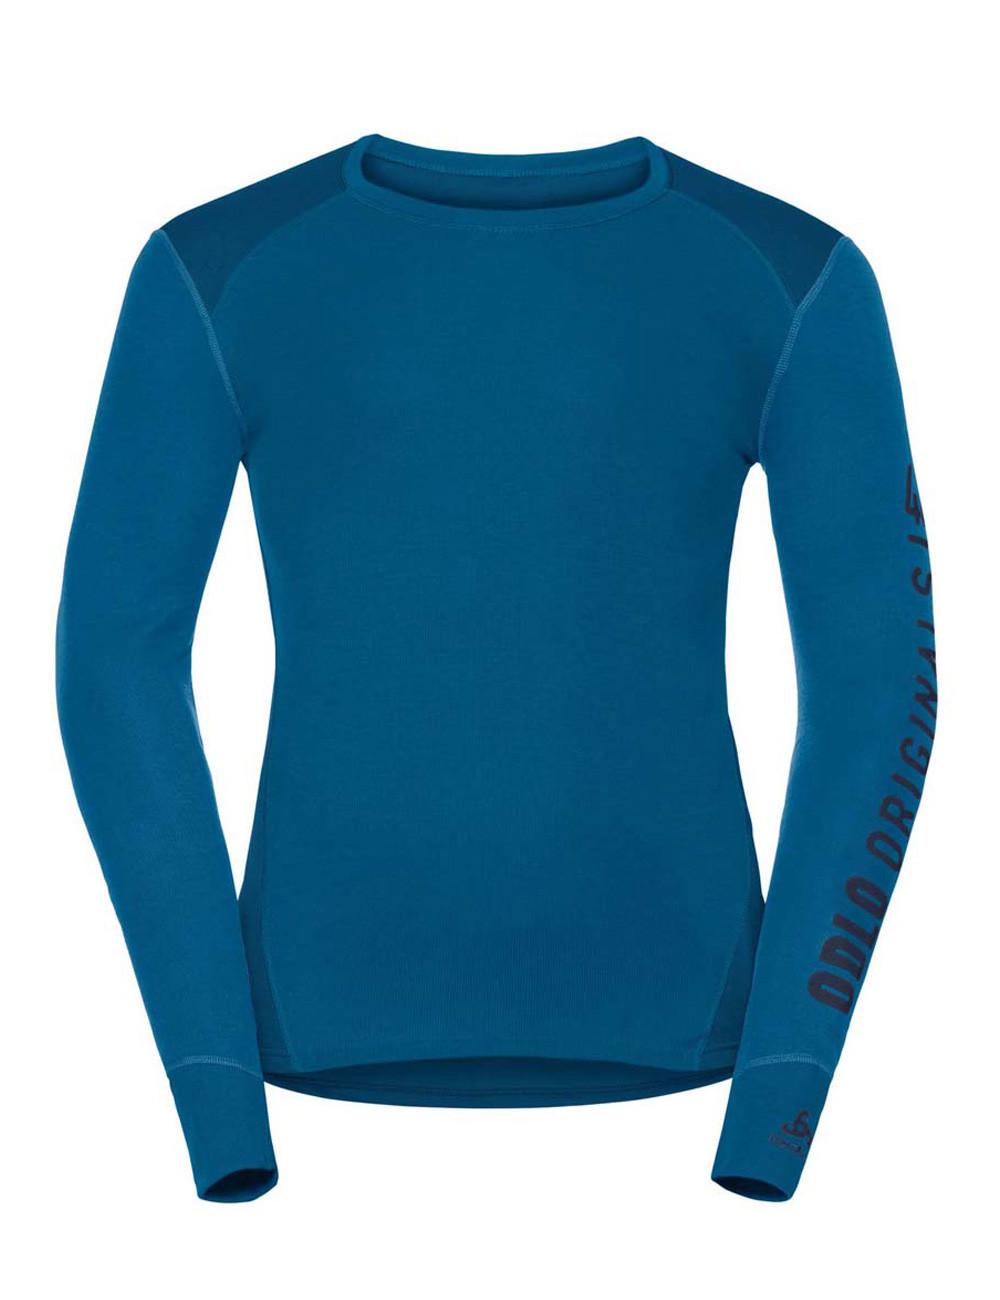 Koszulka termoaktywna męska ODLO REVELSTOKE WARM